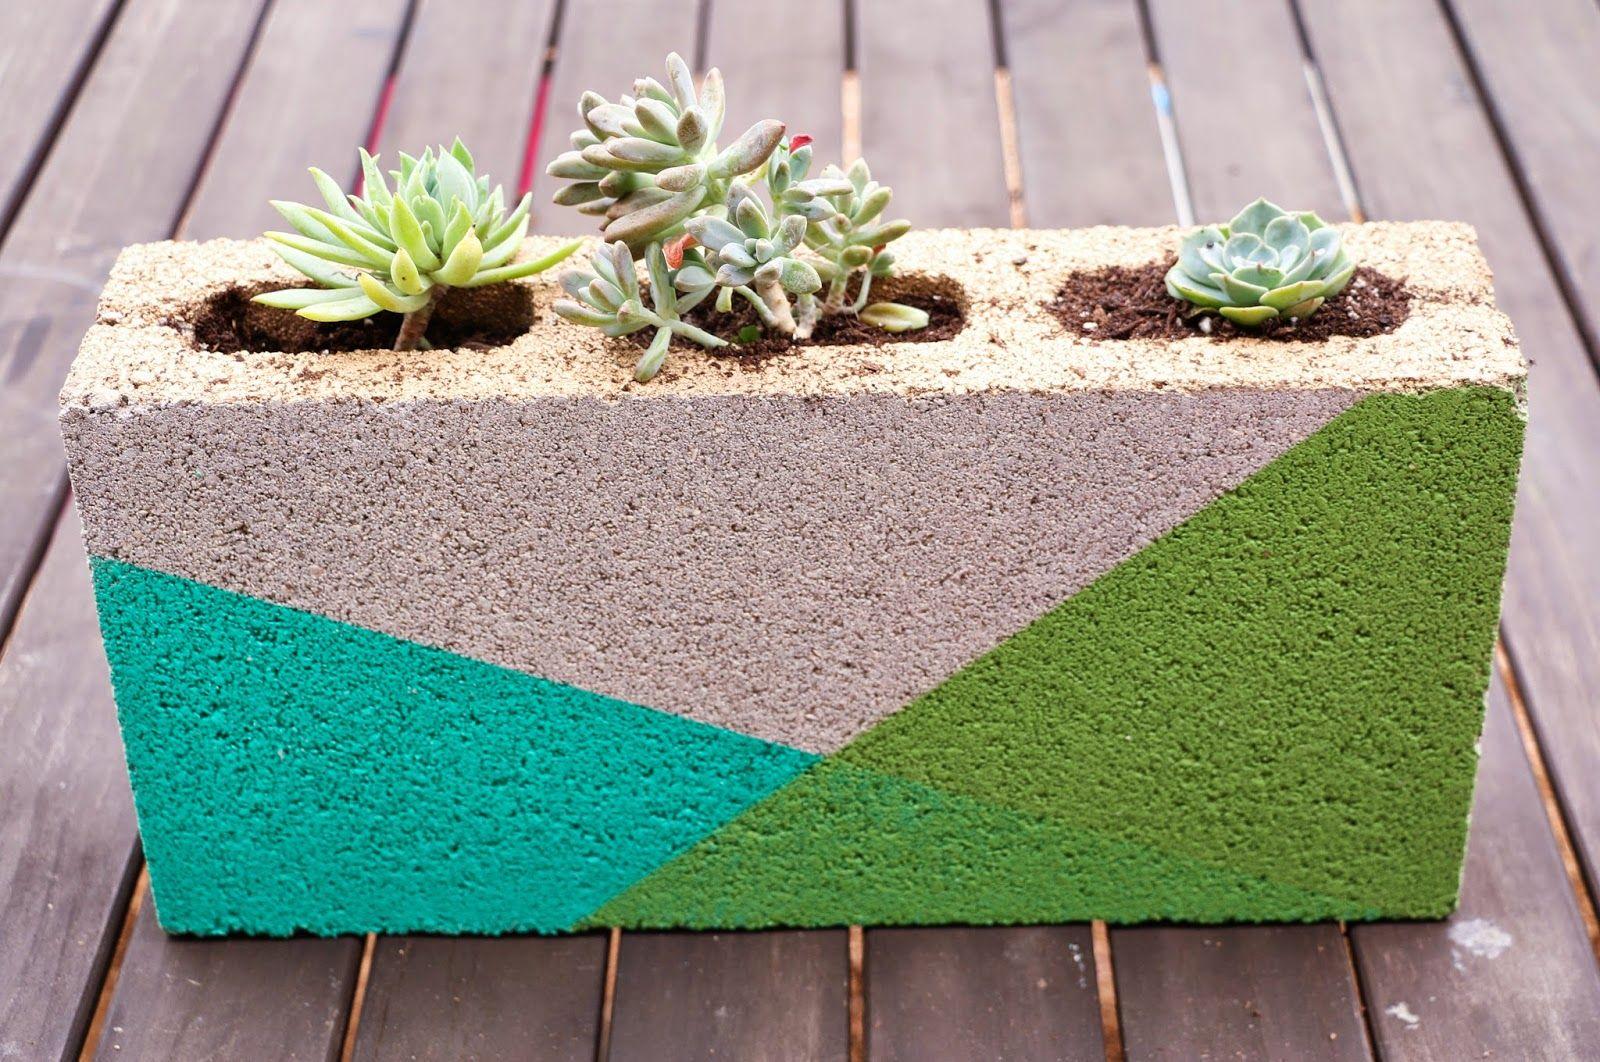 Colorblocked Cinder Block Planter A Kailo Chic Life Cinder Block Garden Diy Planters Succulent Planter Diy